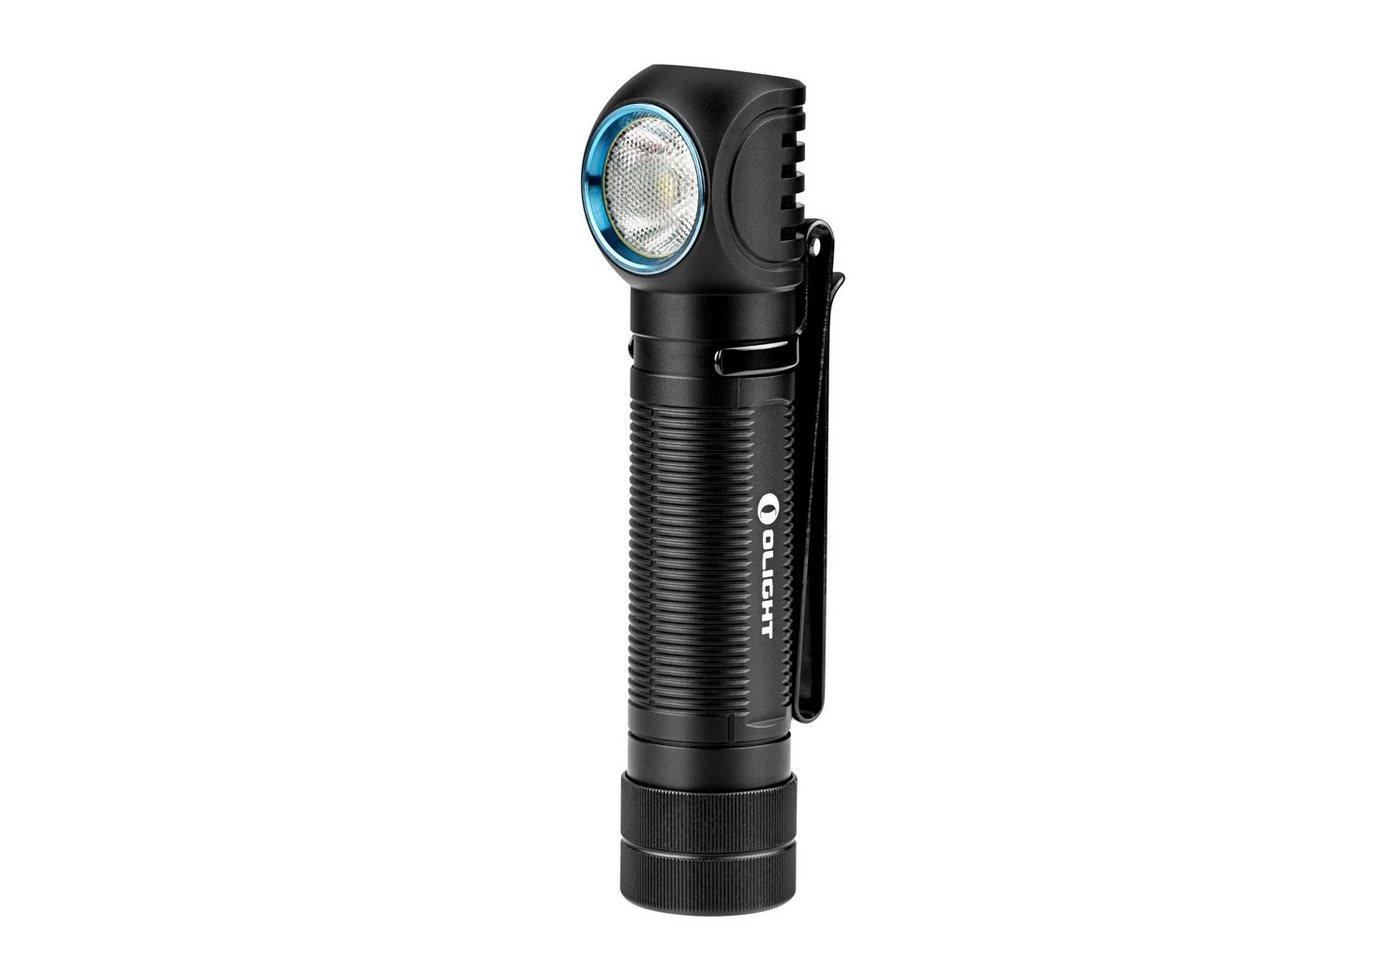 OLIGHT LED Taschenlampe mit Stirnband »H2R Nova-CW« | Lampen > Taschenlampen | Schwarz | OLIGHT